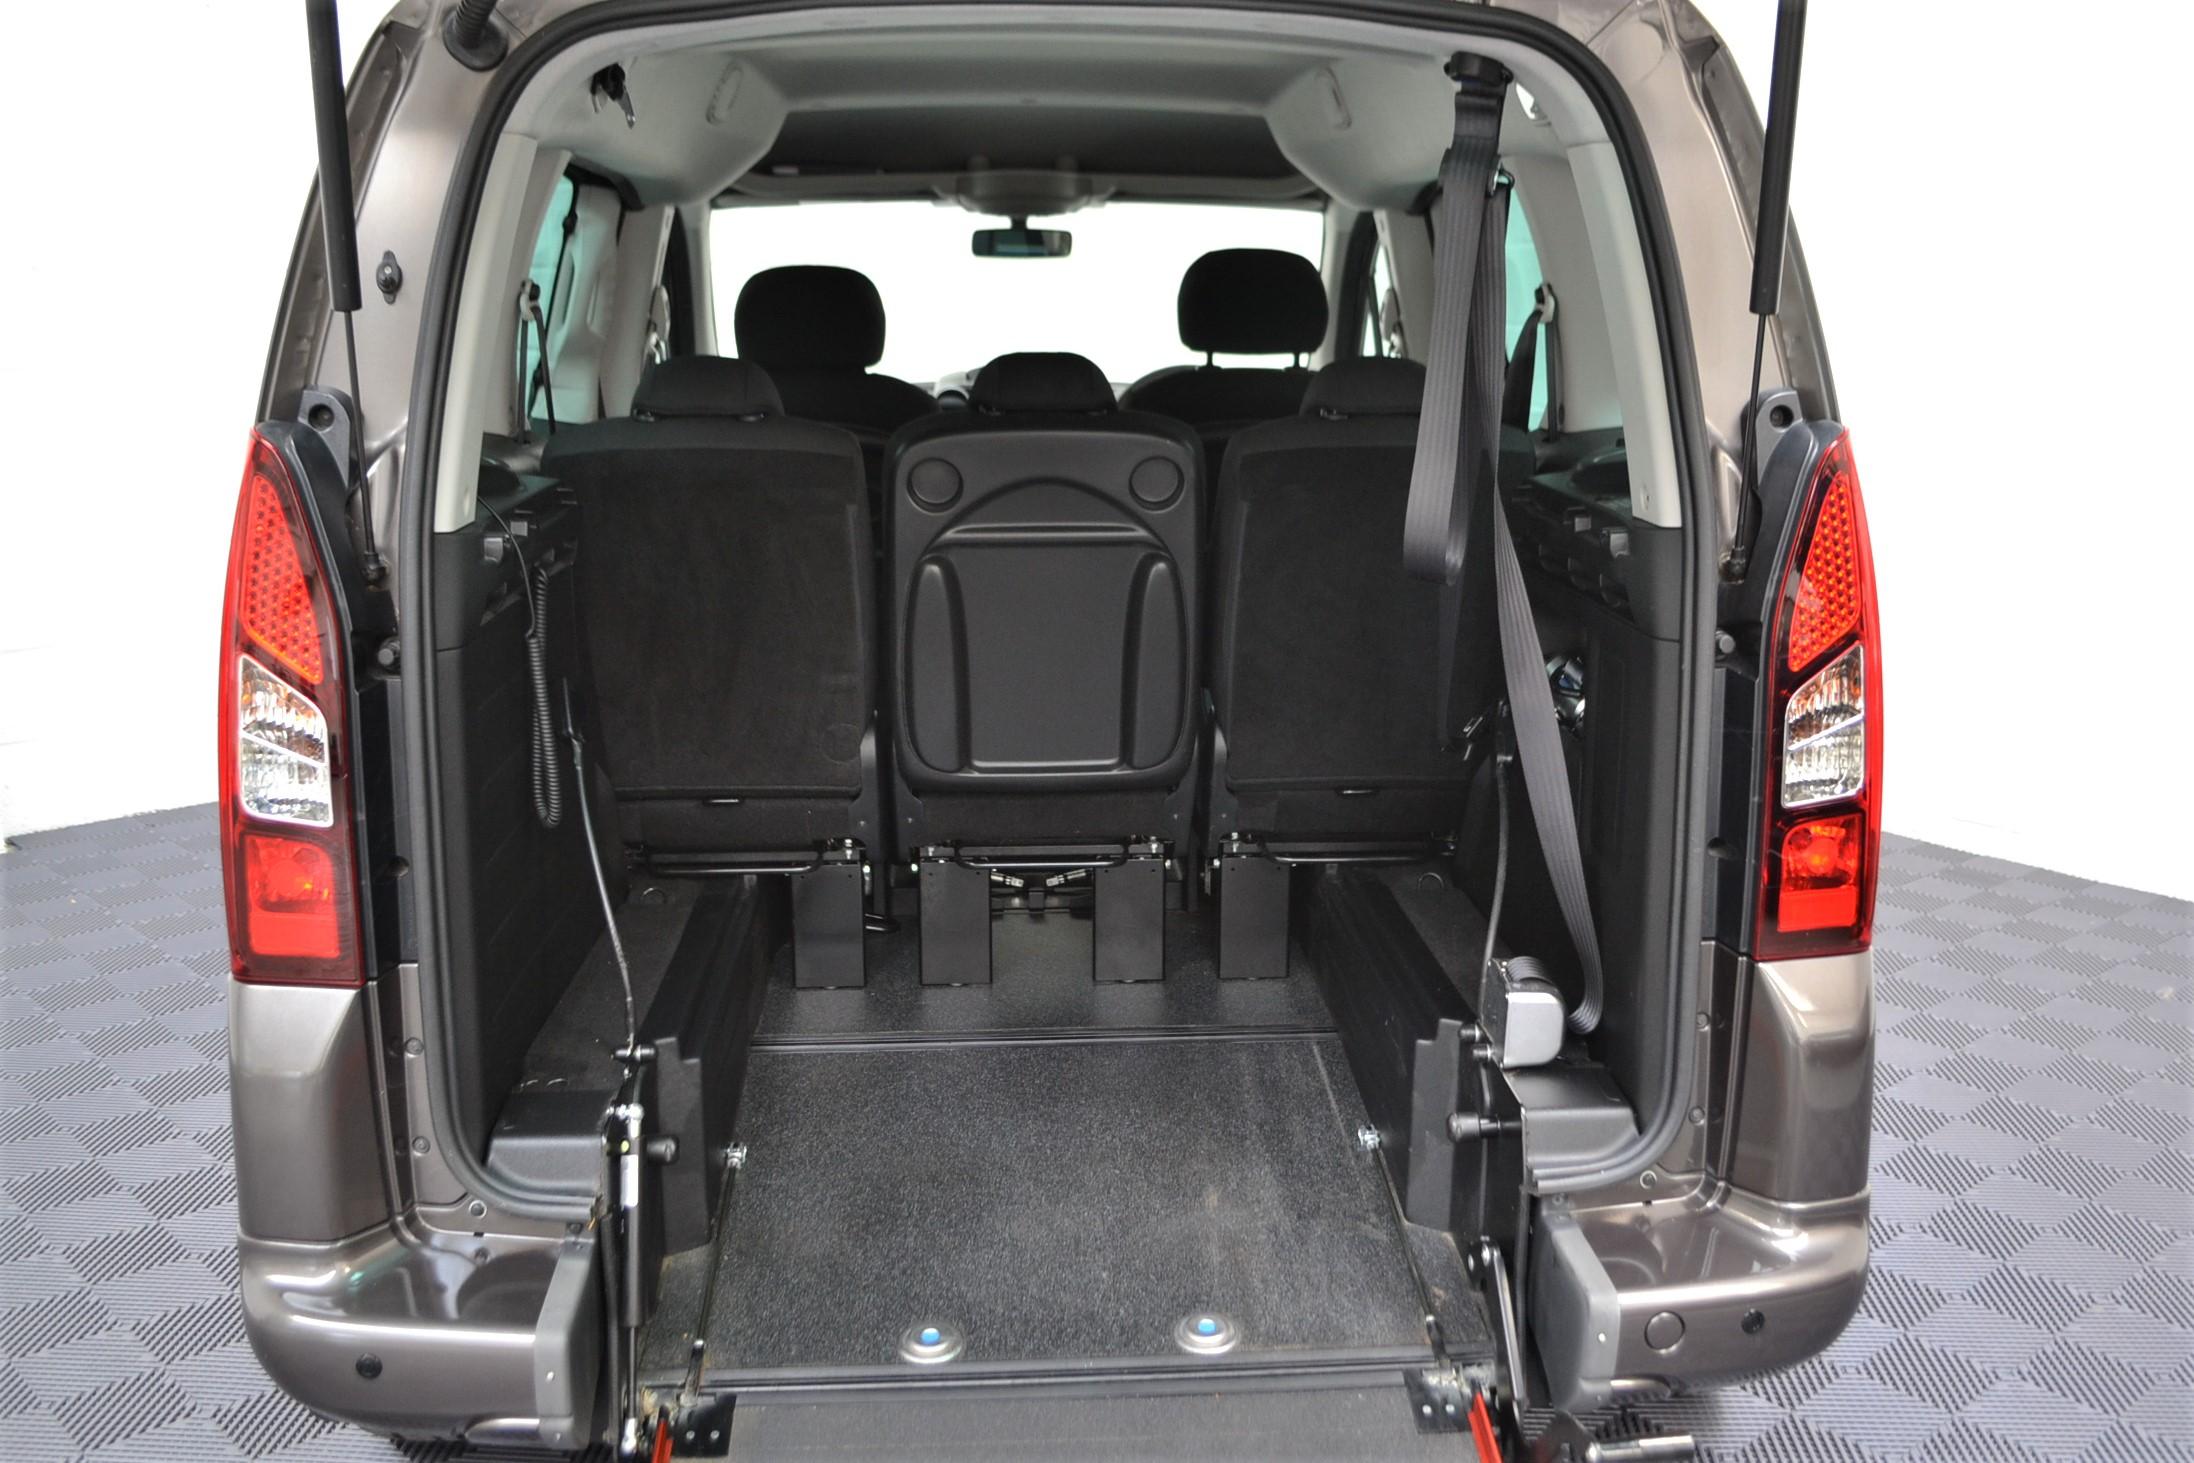 WAV Cars For Sale Bristol Wheelchair Accessible Vehicles Used For Sale Somerset Devon Dorset Bath Peugeot Partner WO16 HNH 2